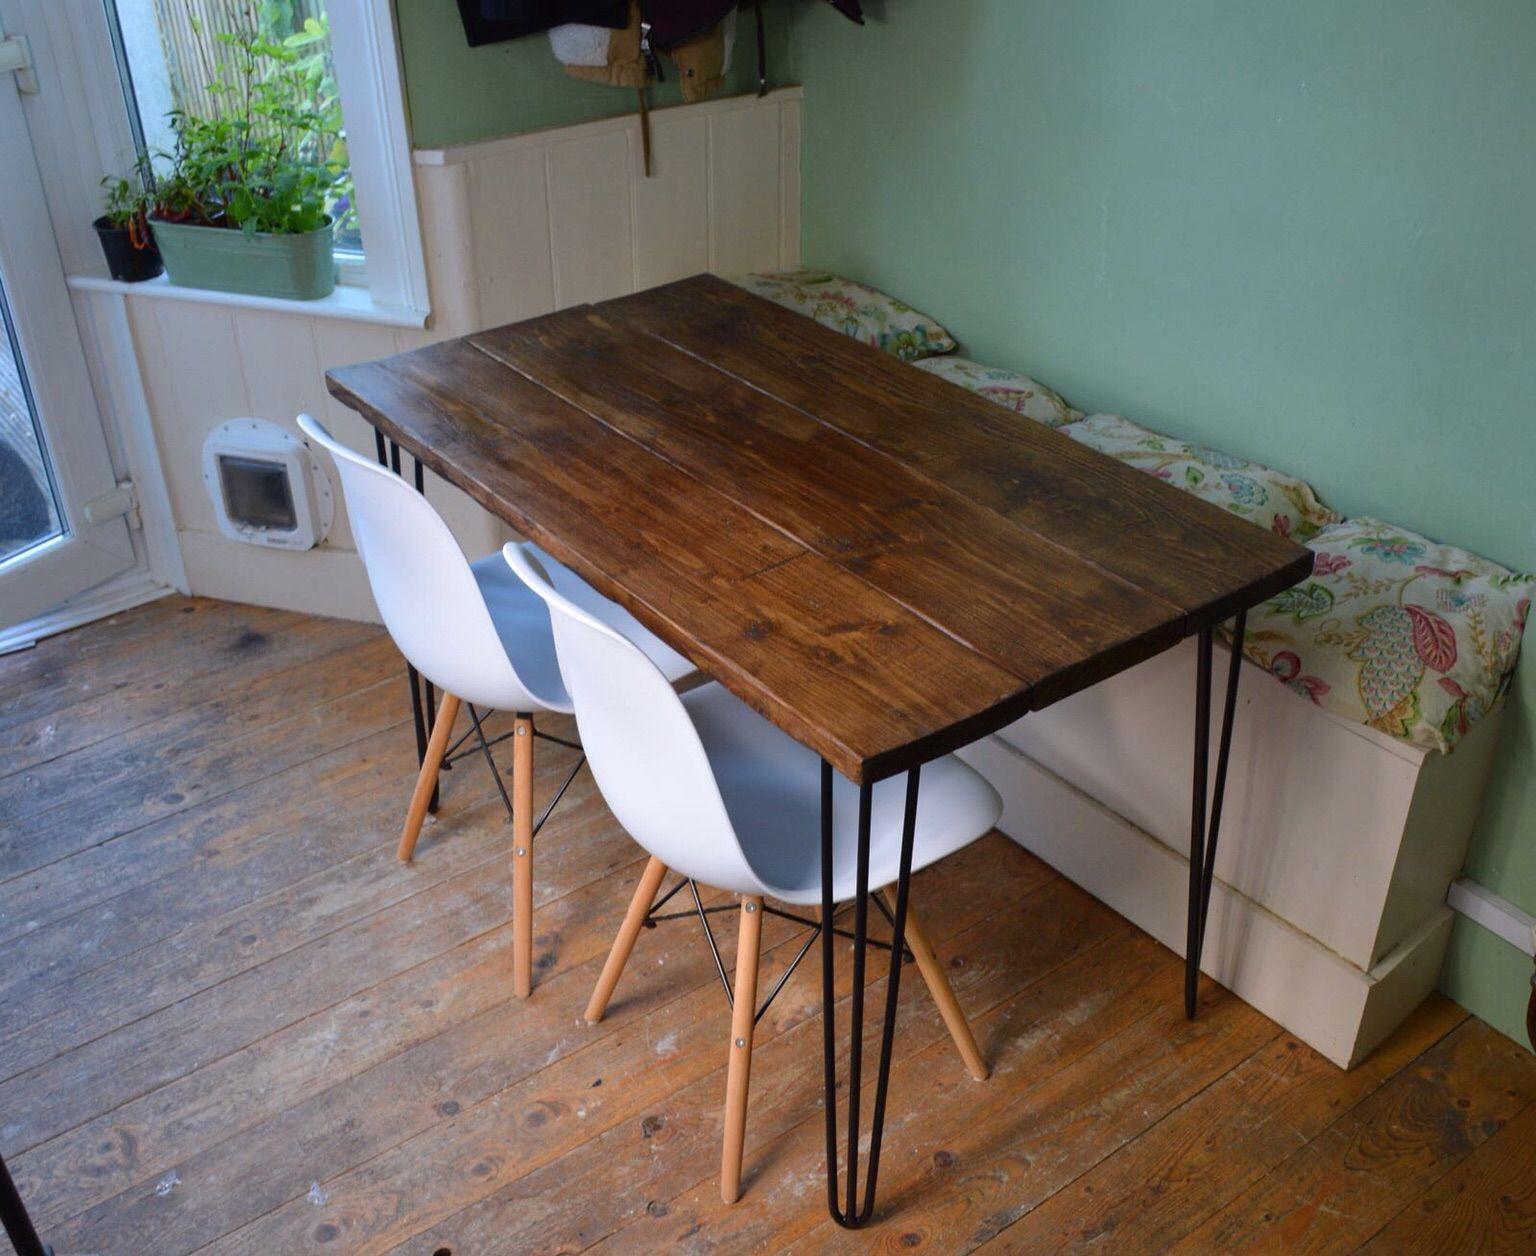 pc hardwood floors danbury of https en shpock com i wgnnhyclwlx6yhw5 2018 02 12t214109 with industrial wood hairpin dining table medium